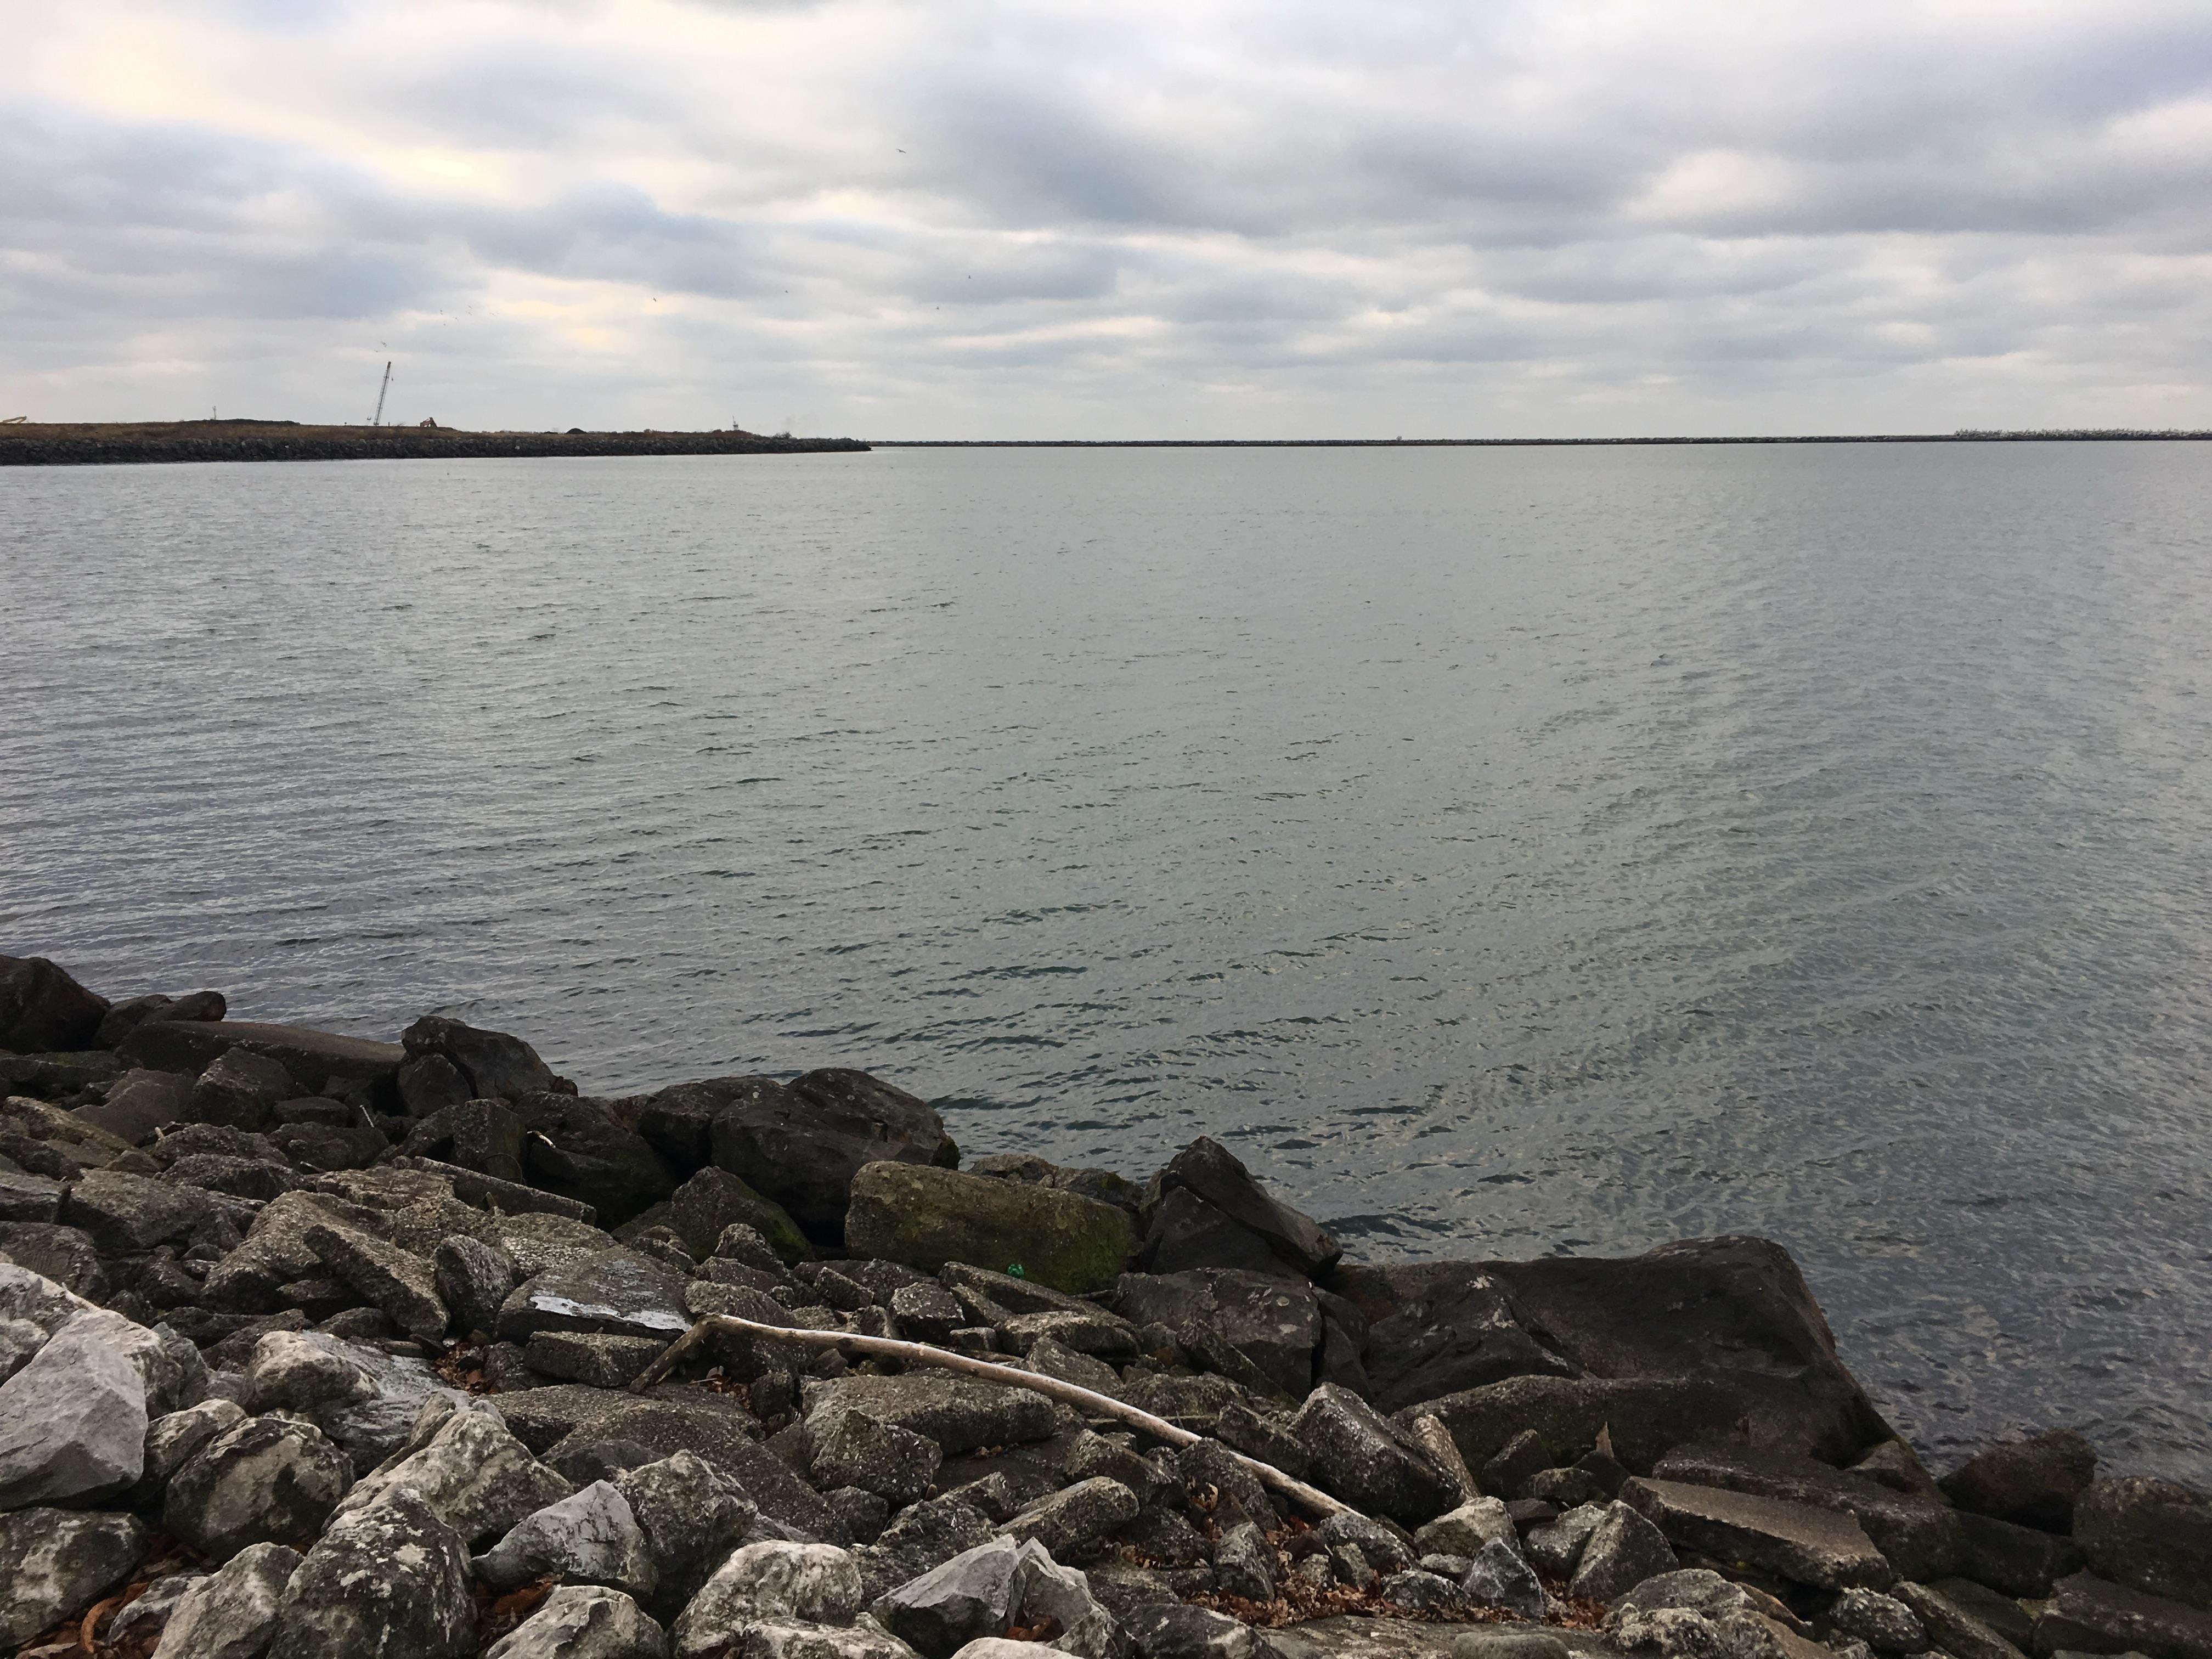 Caption: Lake Erie, Credit: Elizabeth Miller/ideastream